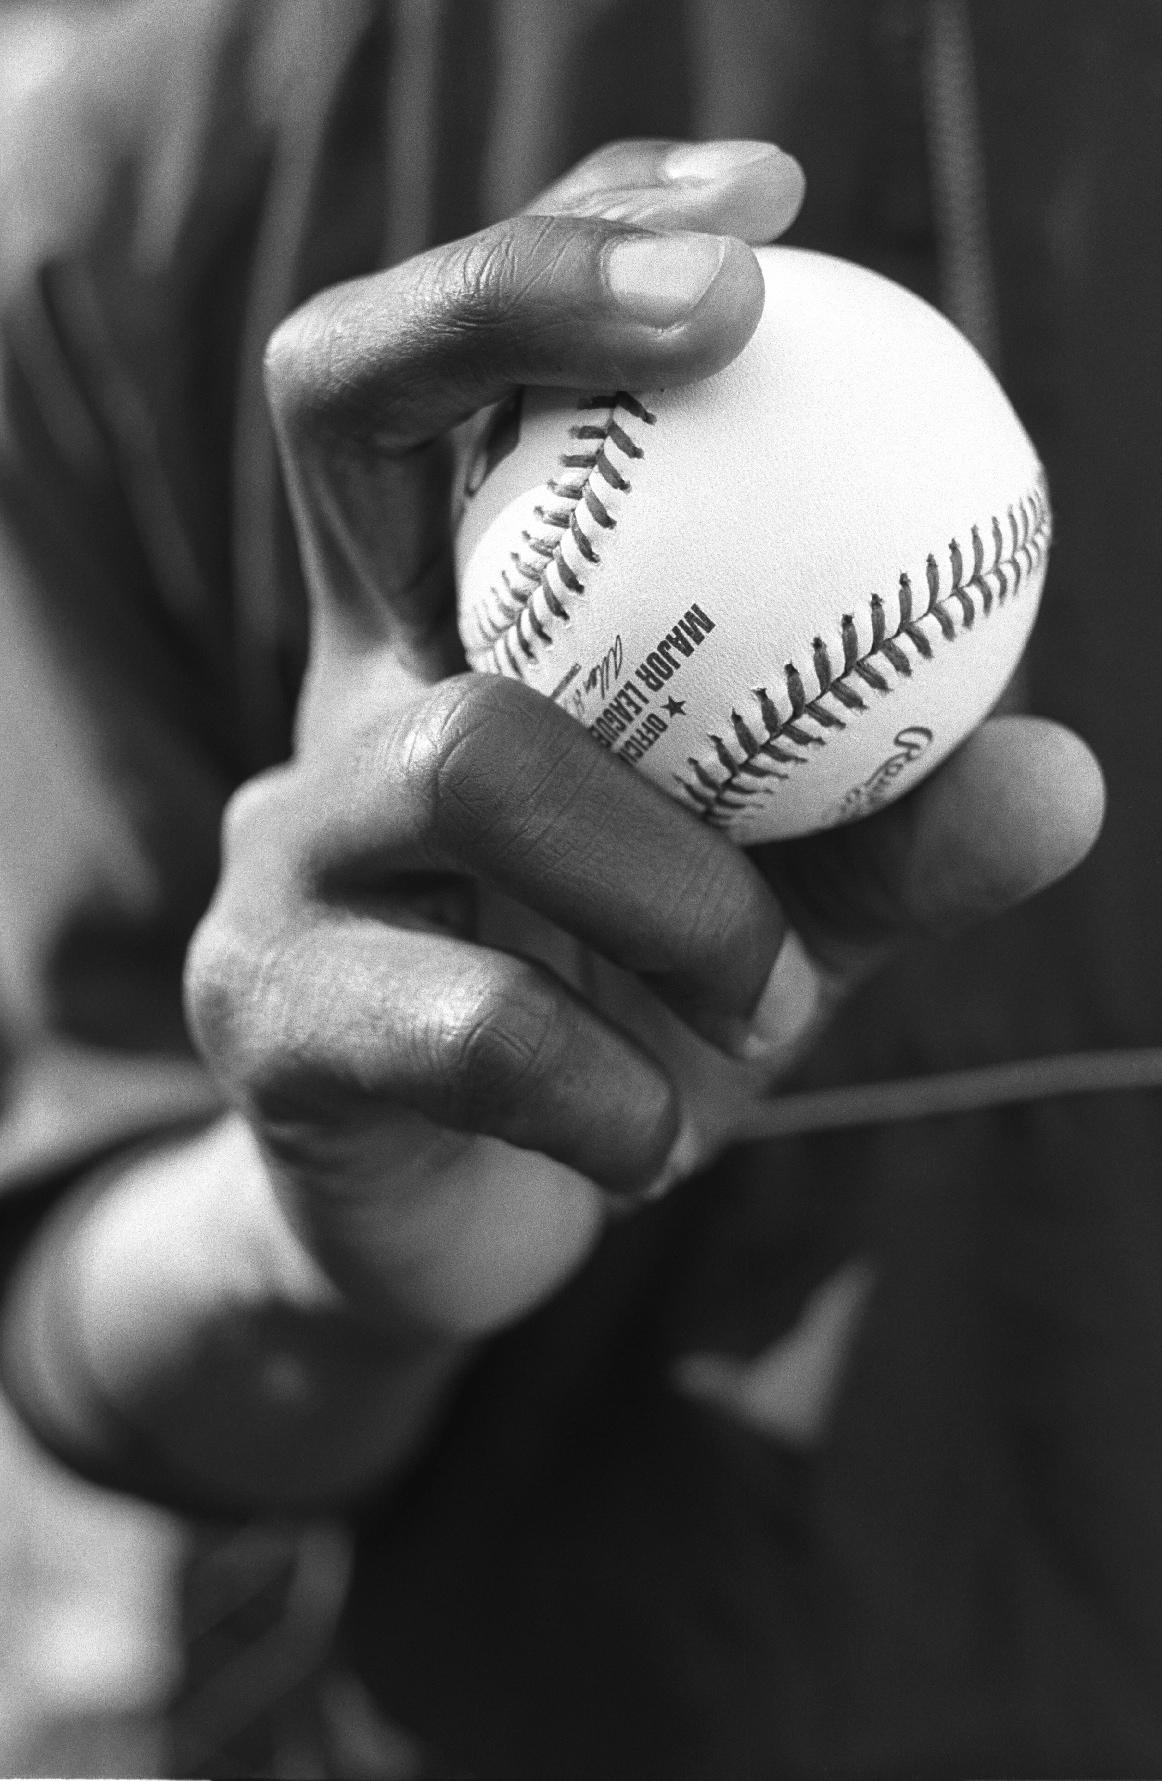 Hand of pitcher Felix Rodriquez